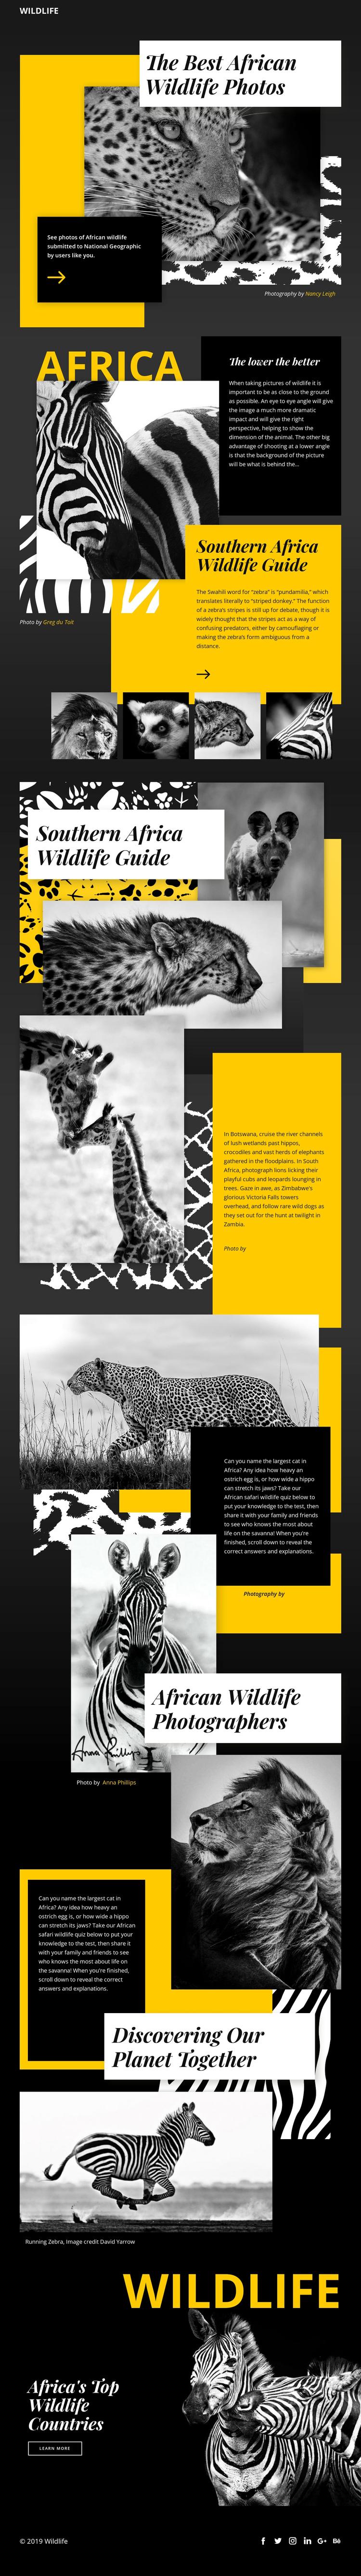 Wildlife Photos Website Builder Software